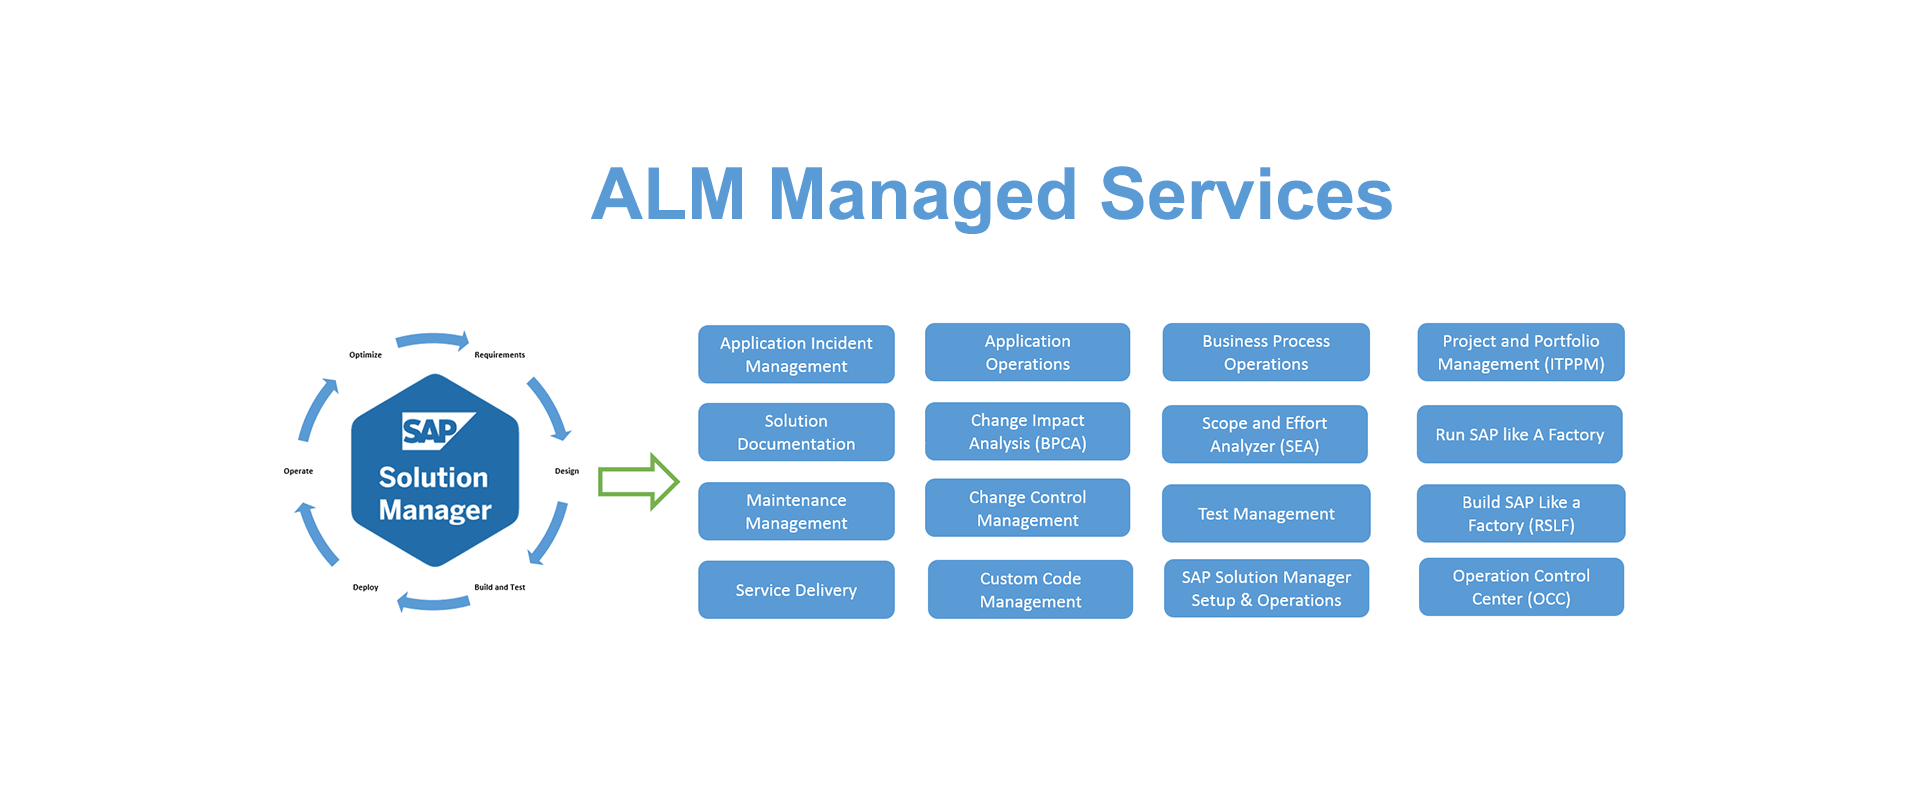 SAP ALM Managed Services